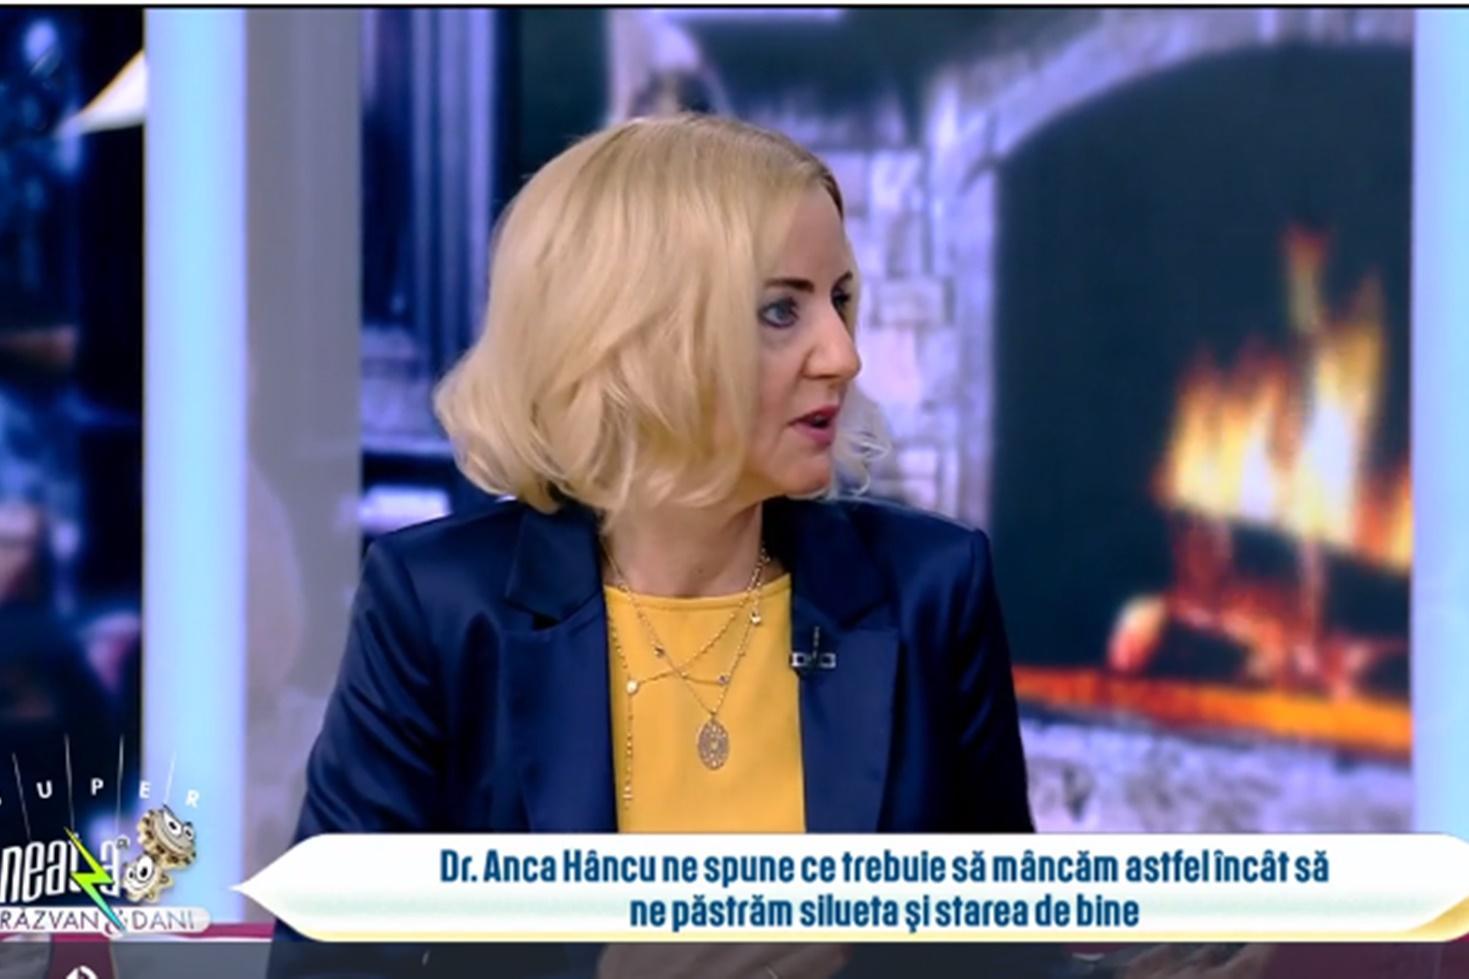 Doctor Anca Hâncu